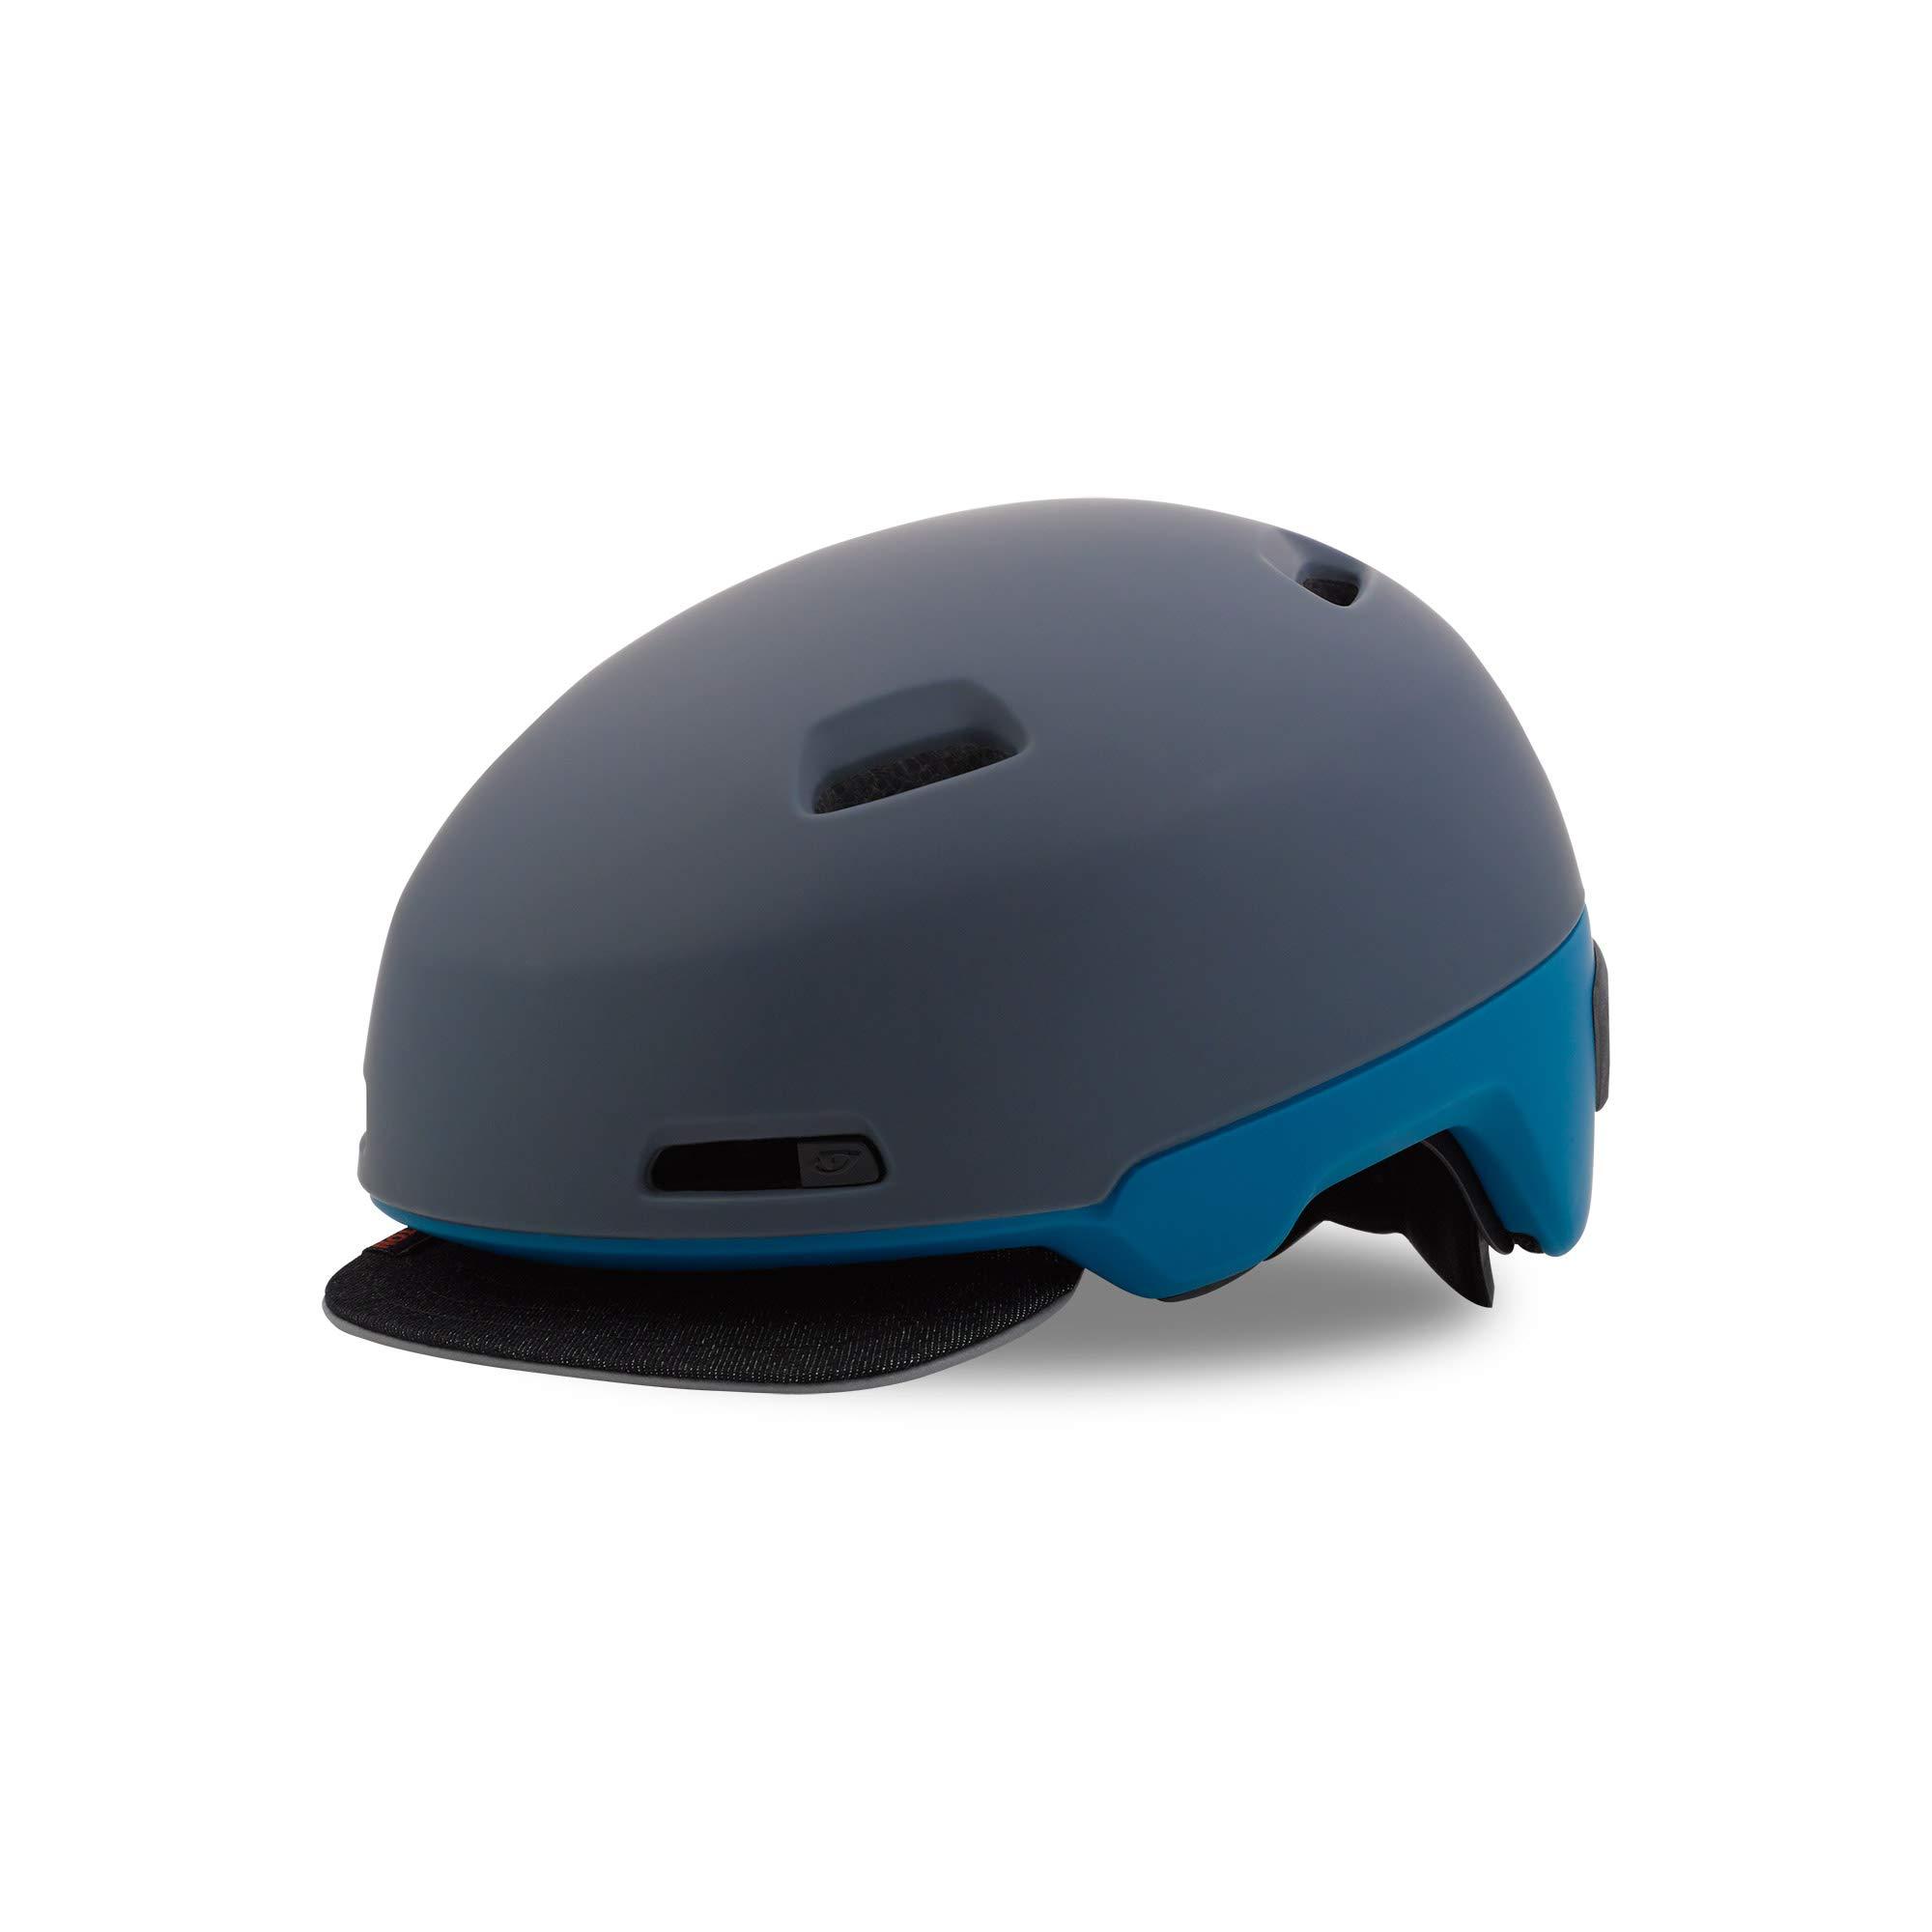 Giro Sutton Fahrradhelm, mat Dark Slate/Blue Teal, S